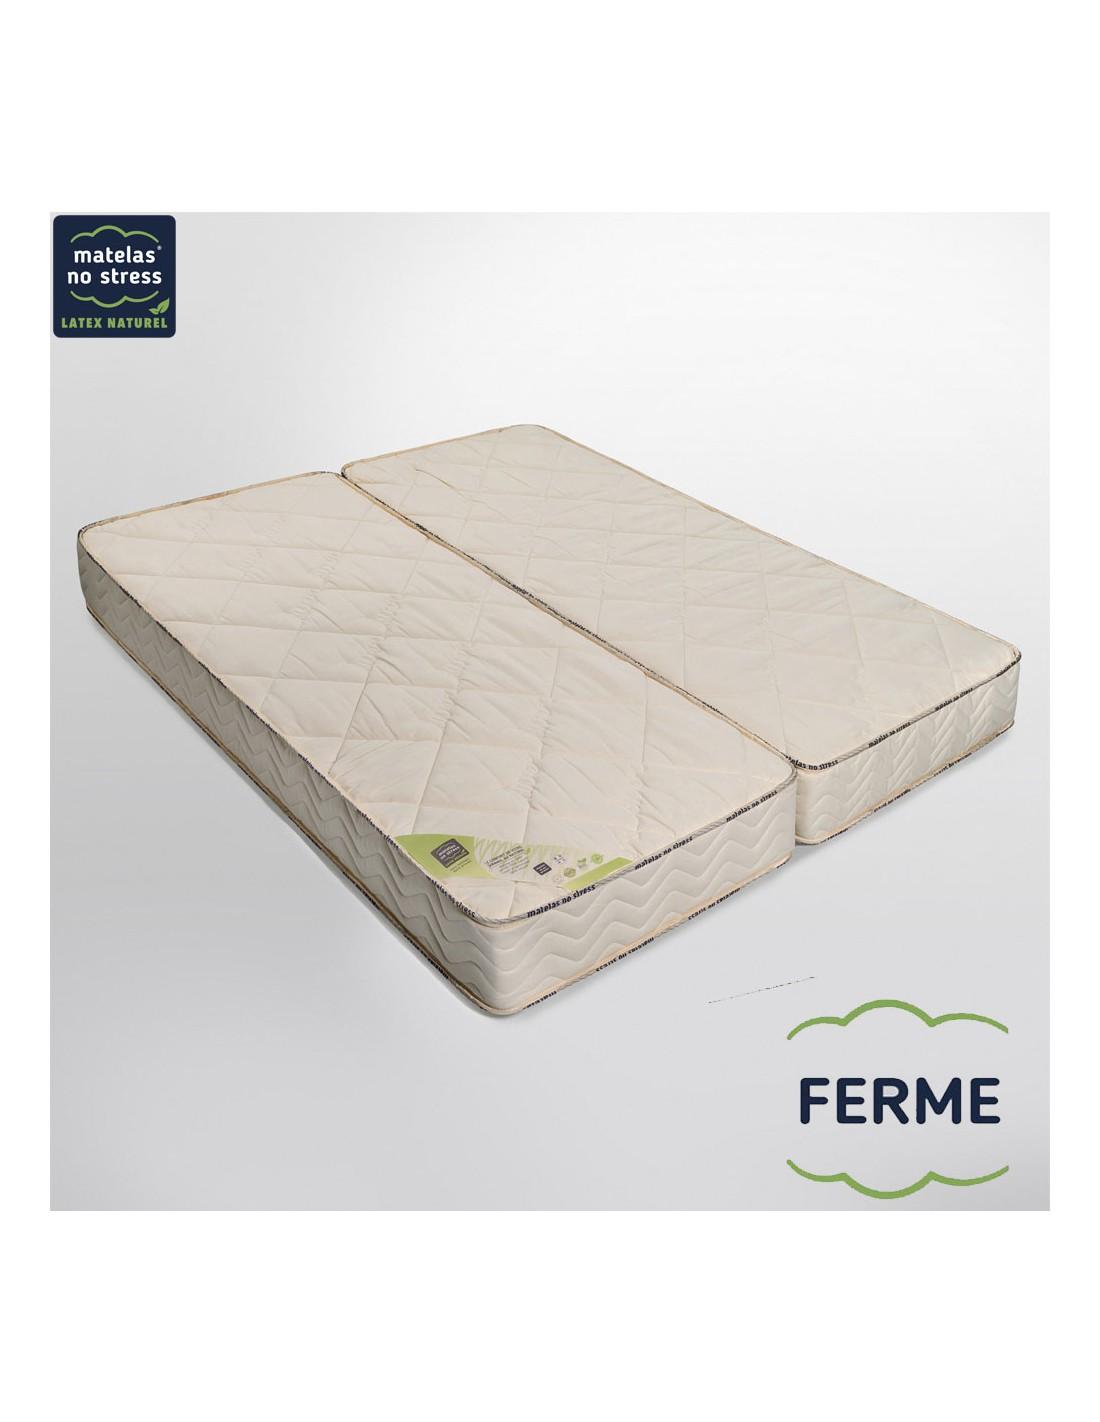 matelas duo 80 80x190 latex naturel haut de gamme ferme 21 cm. Black Bedroom Furniture Sets. Home Design Ideas